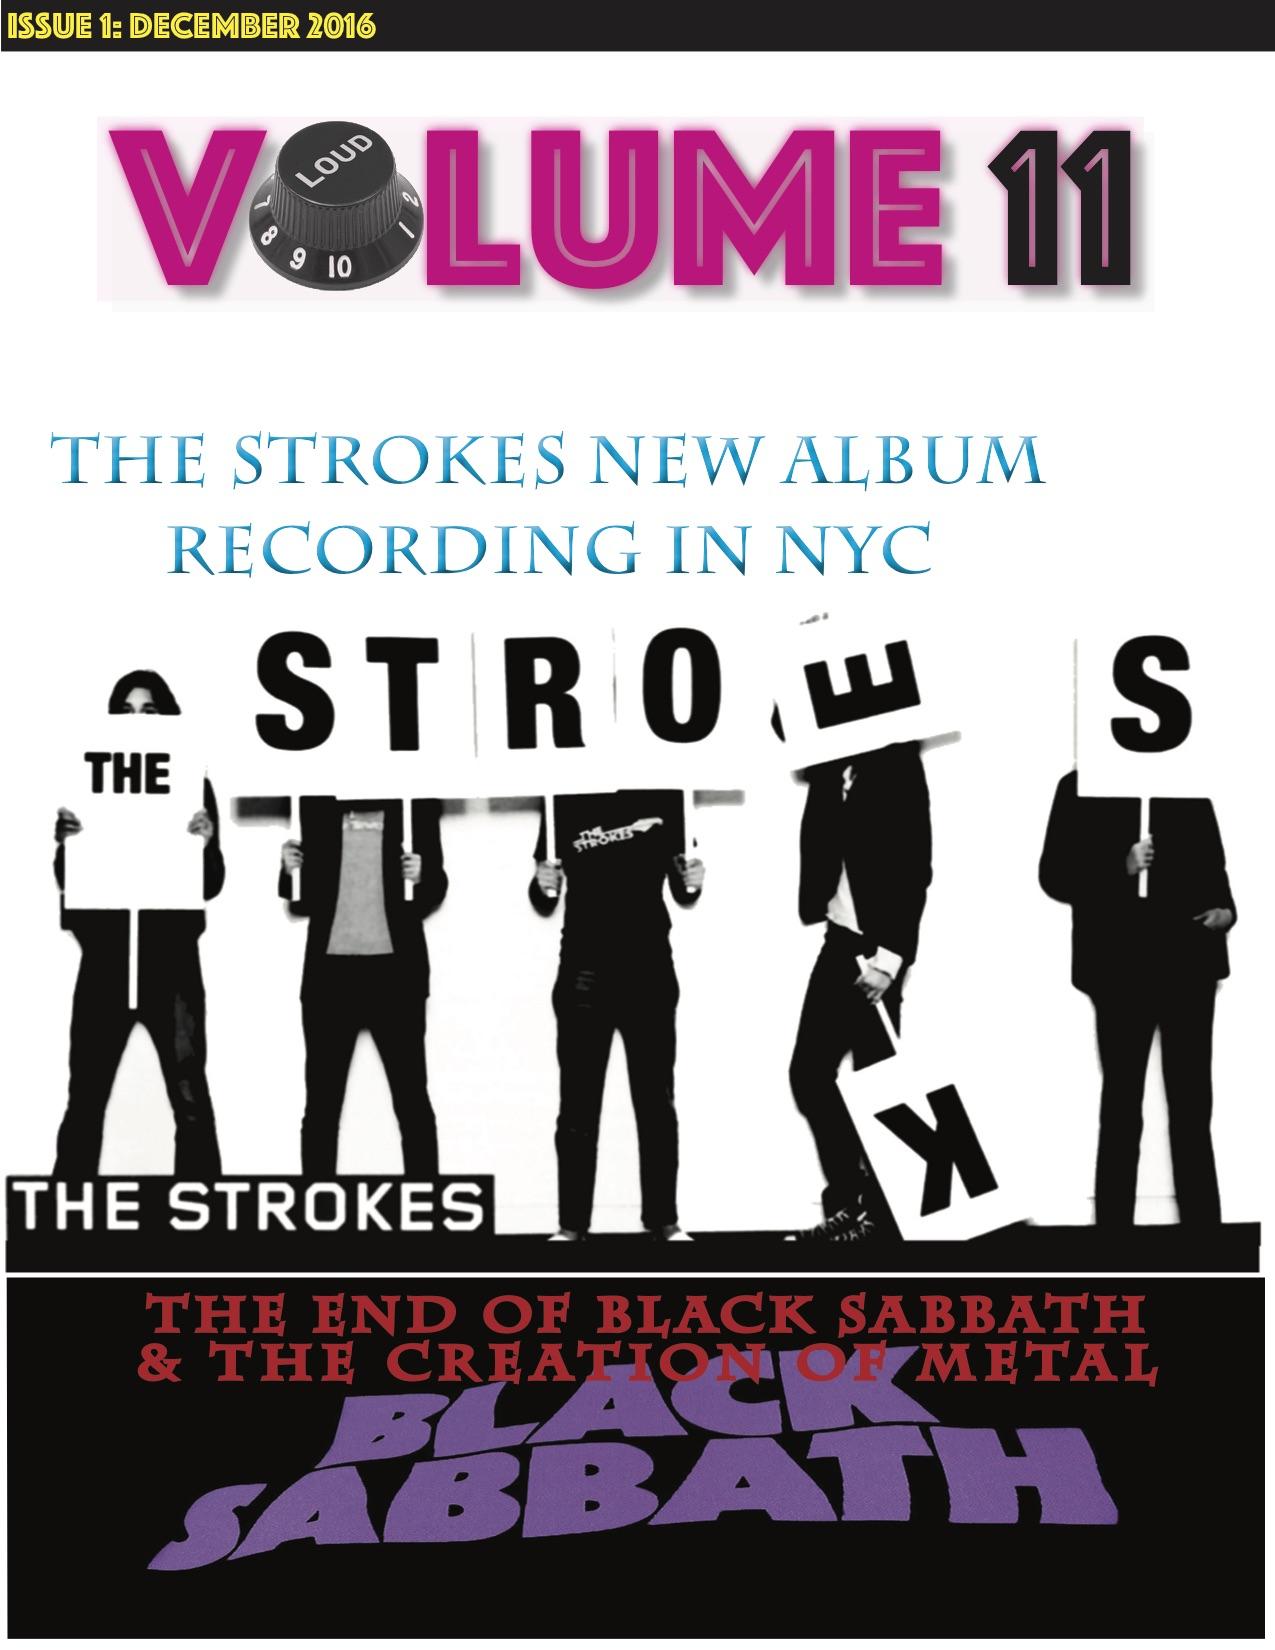 Volume 11-1st Edition Cover.jpg